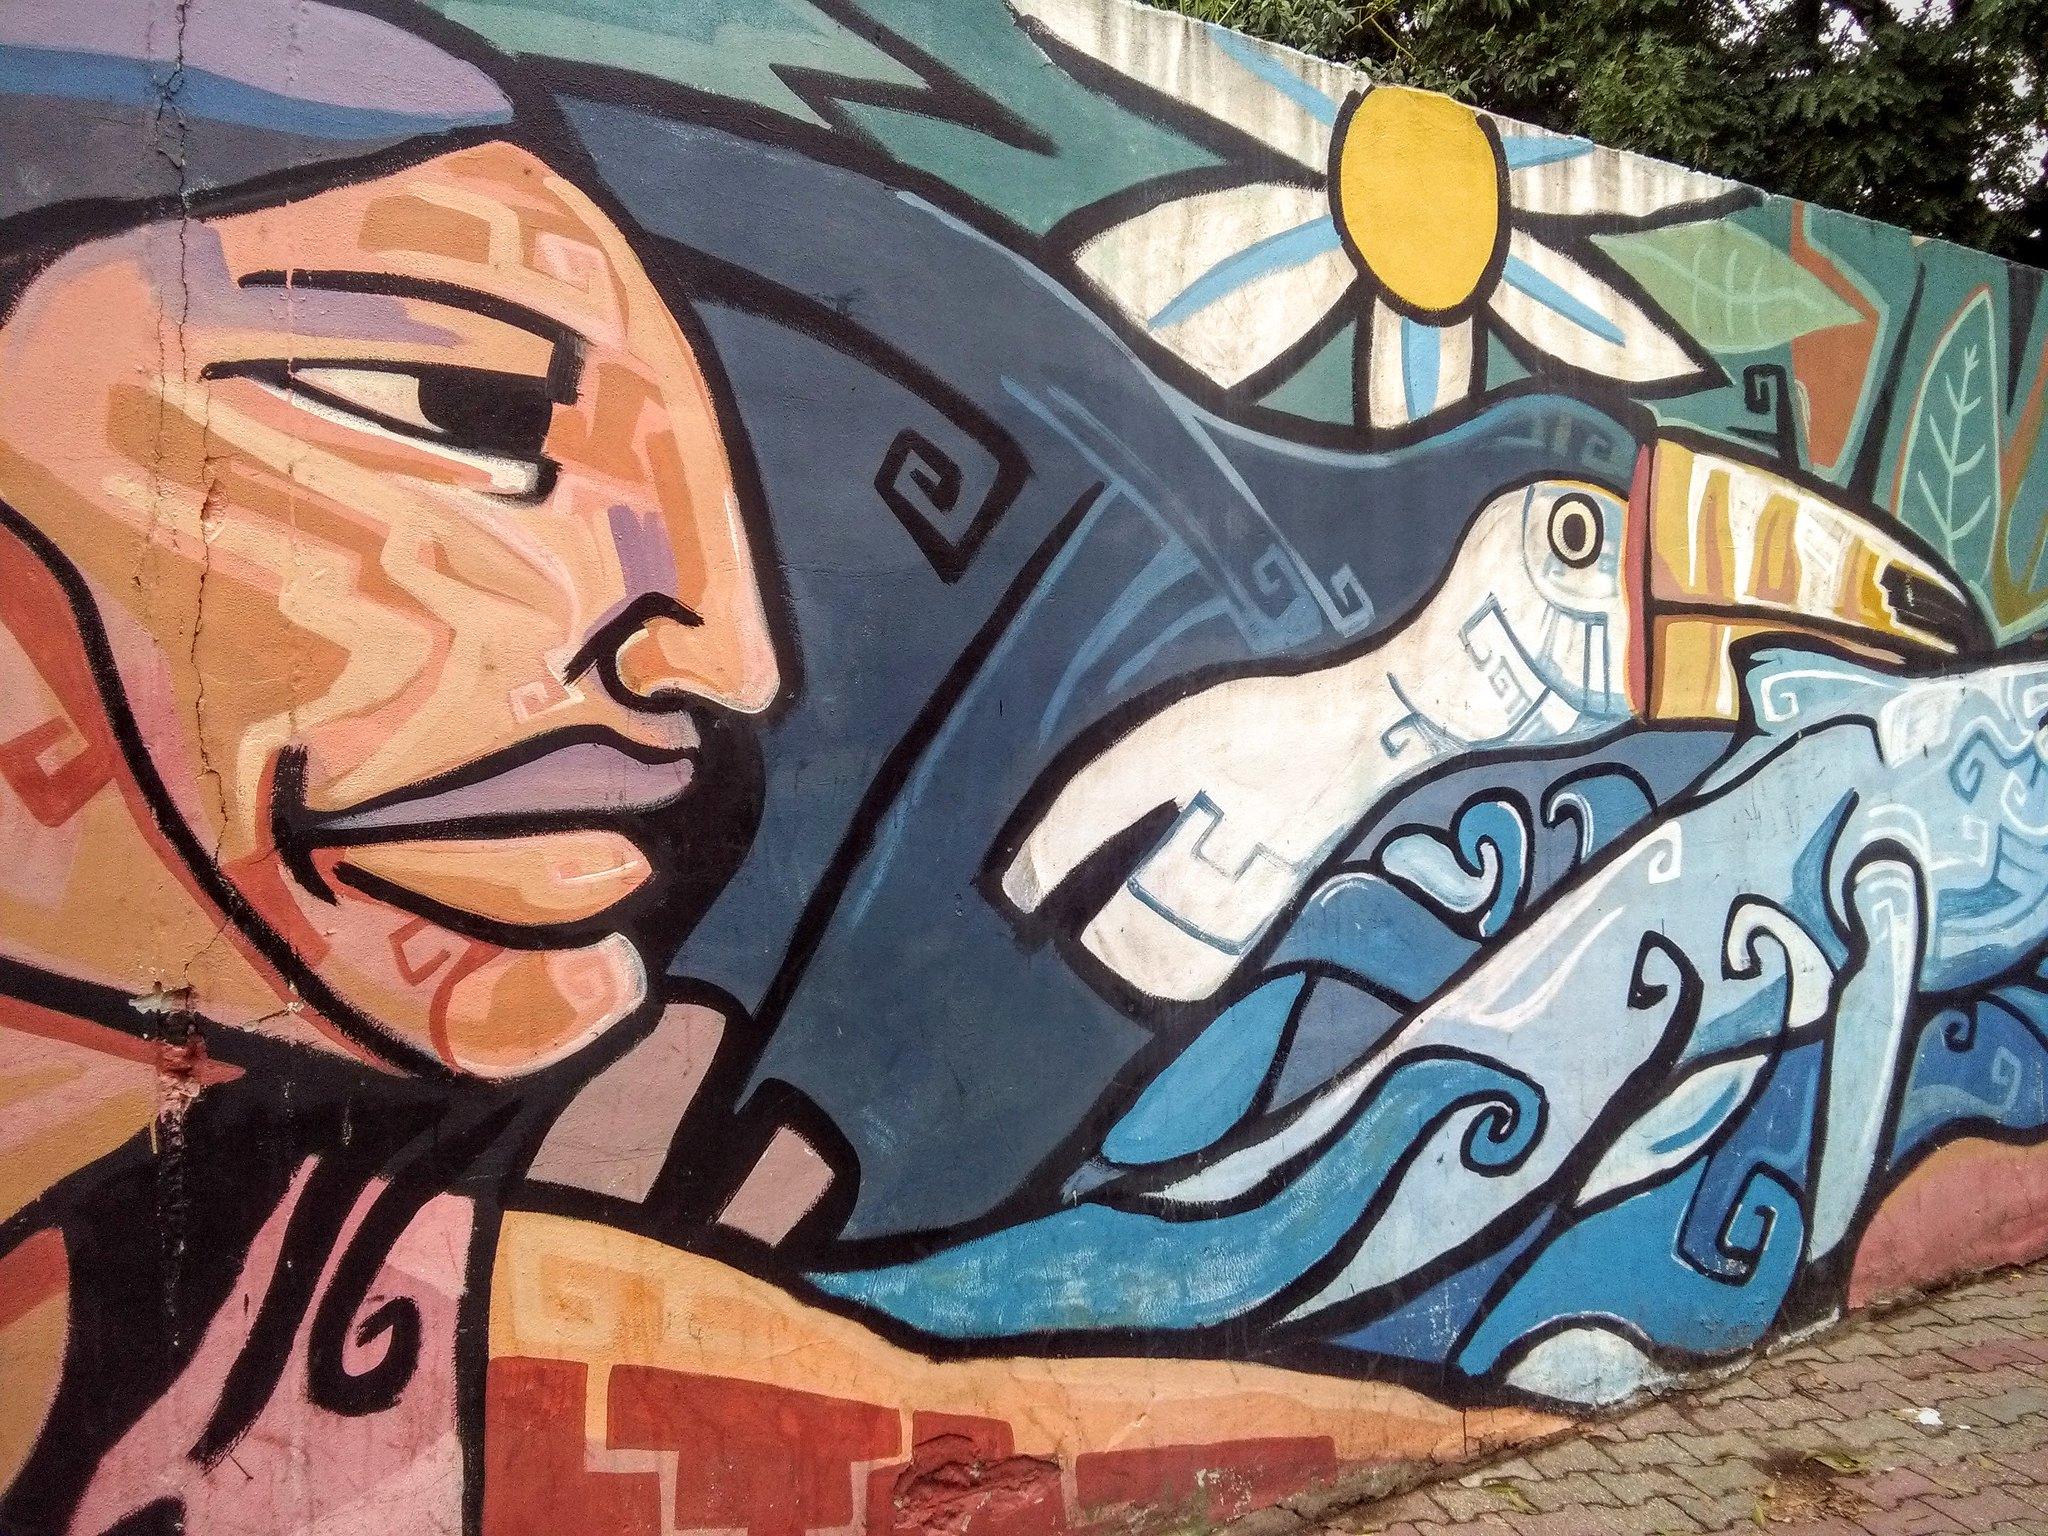 Street art near Museo Cientifico